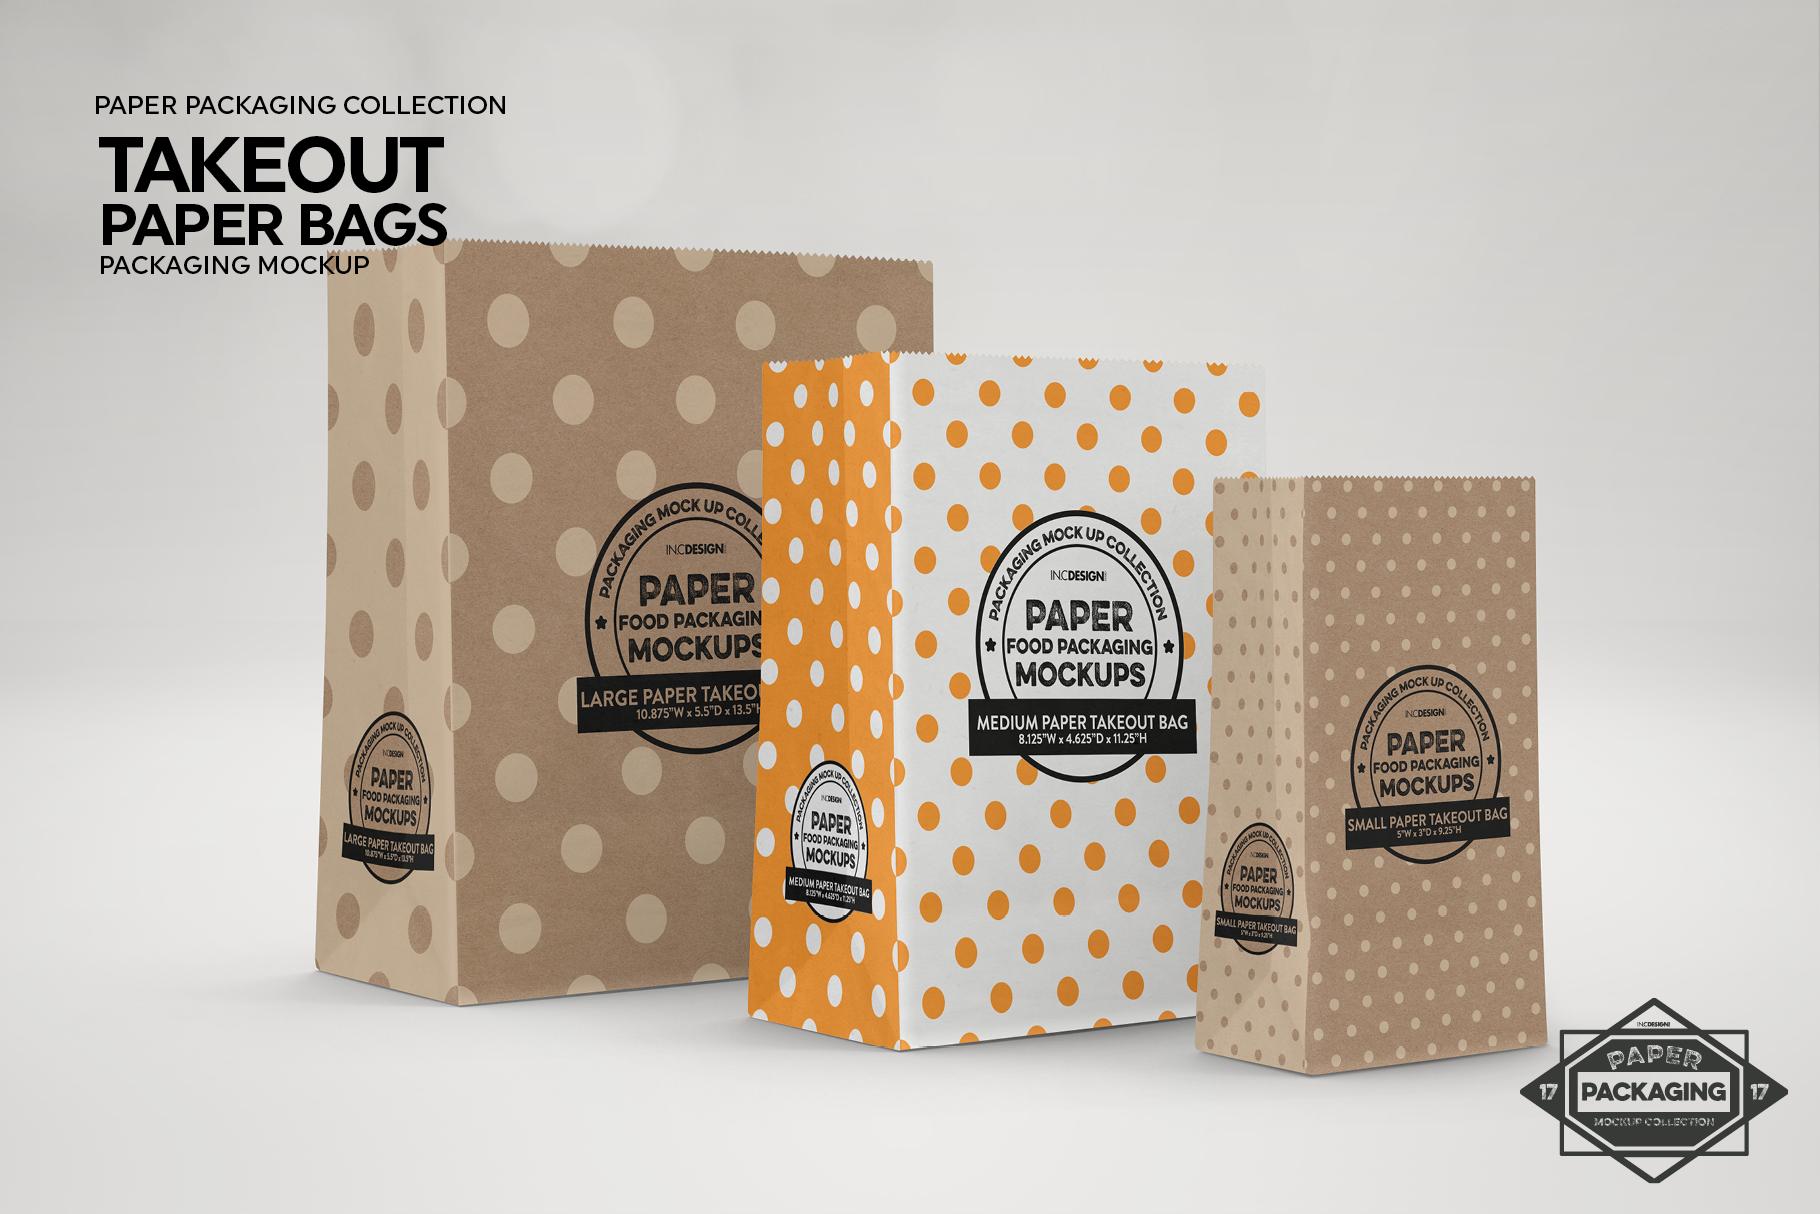 VOL. 17 Paper Box Packaging Mockups example image 2